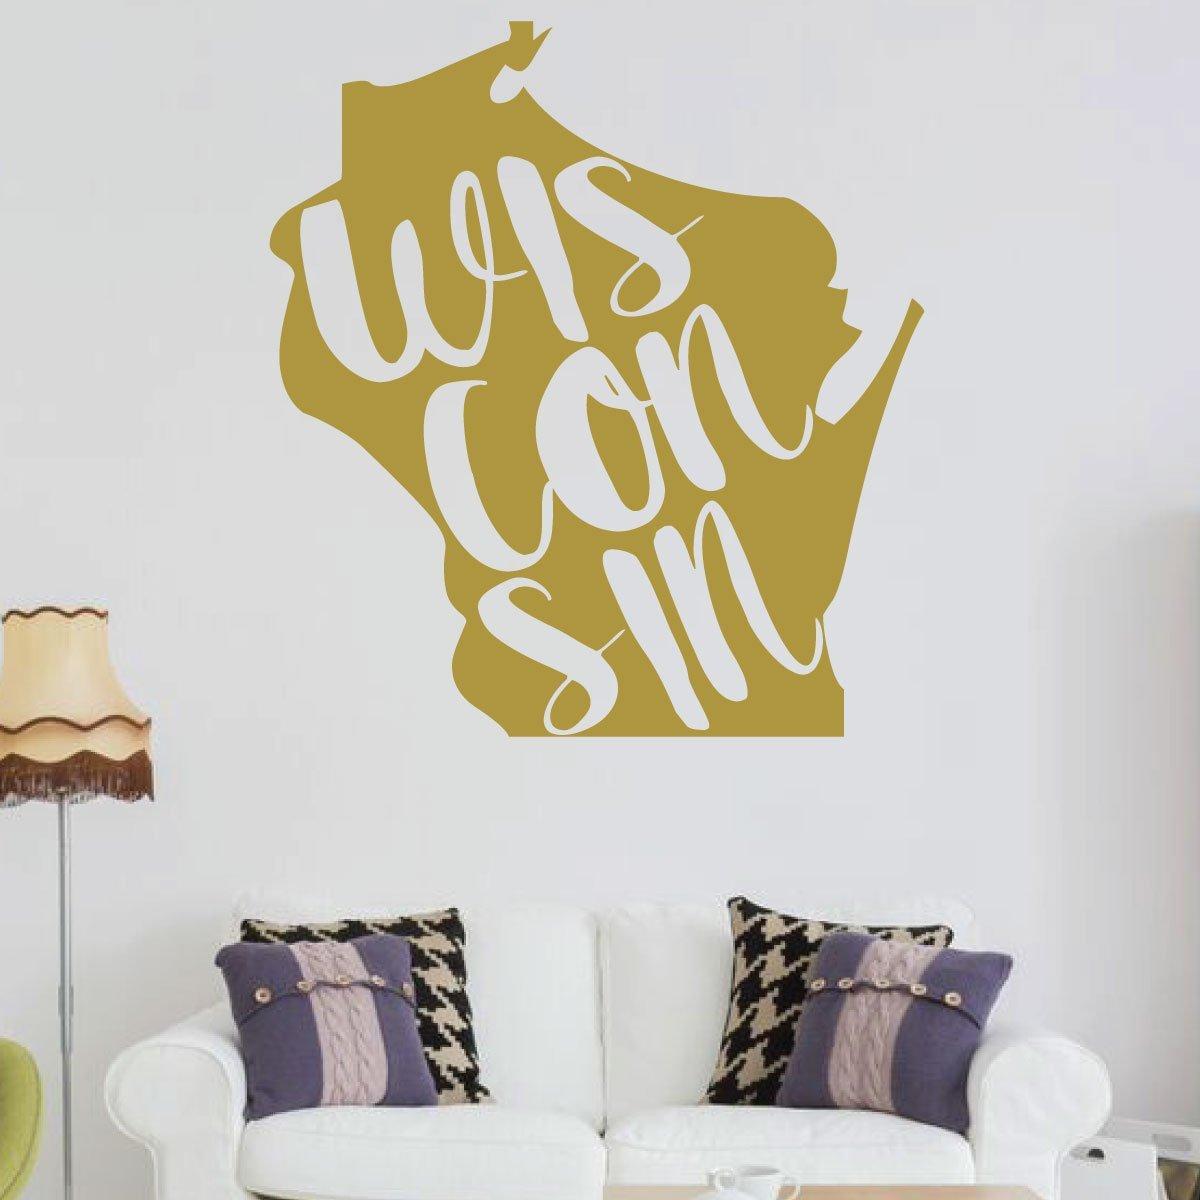 Amazon.com: Wisconsin Wall Decor - States Vinyl Silhouette Art for ...